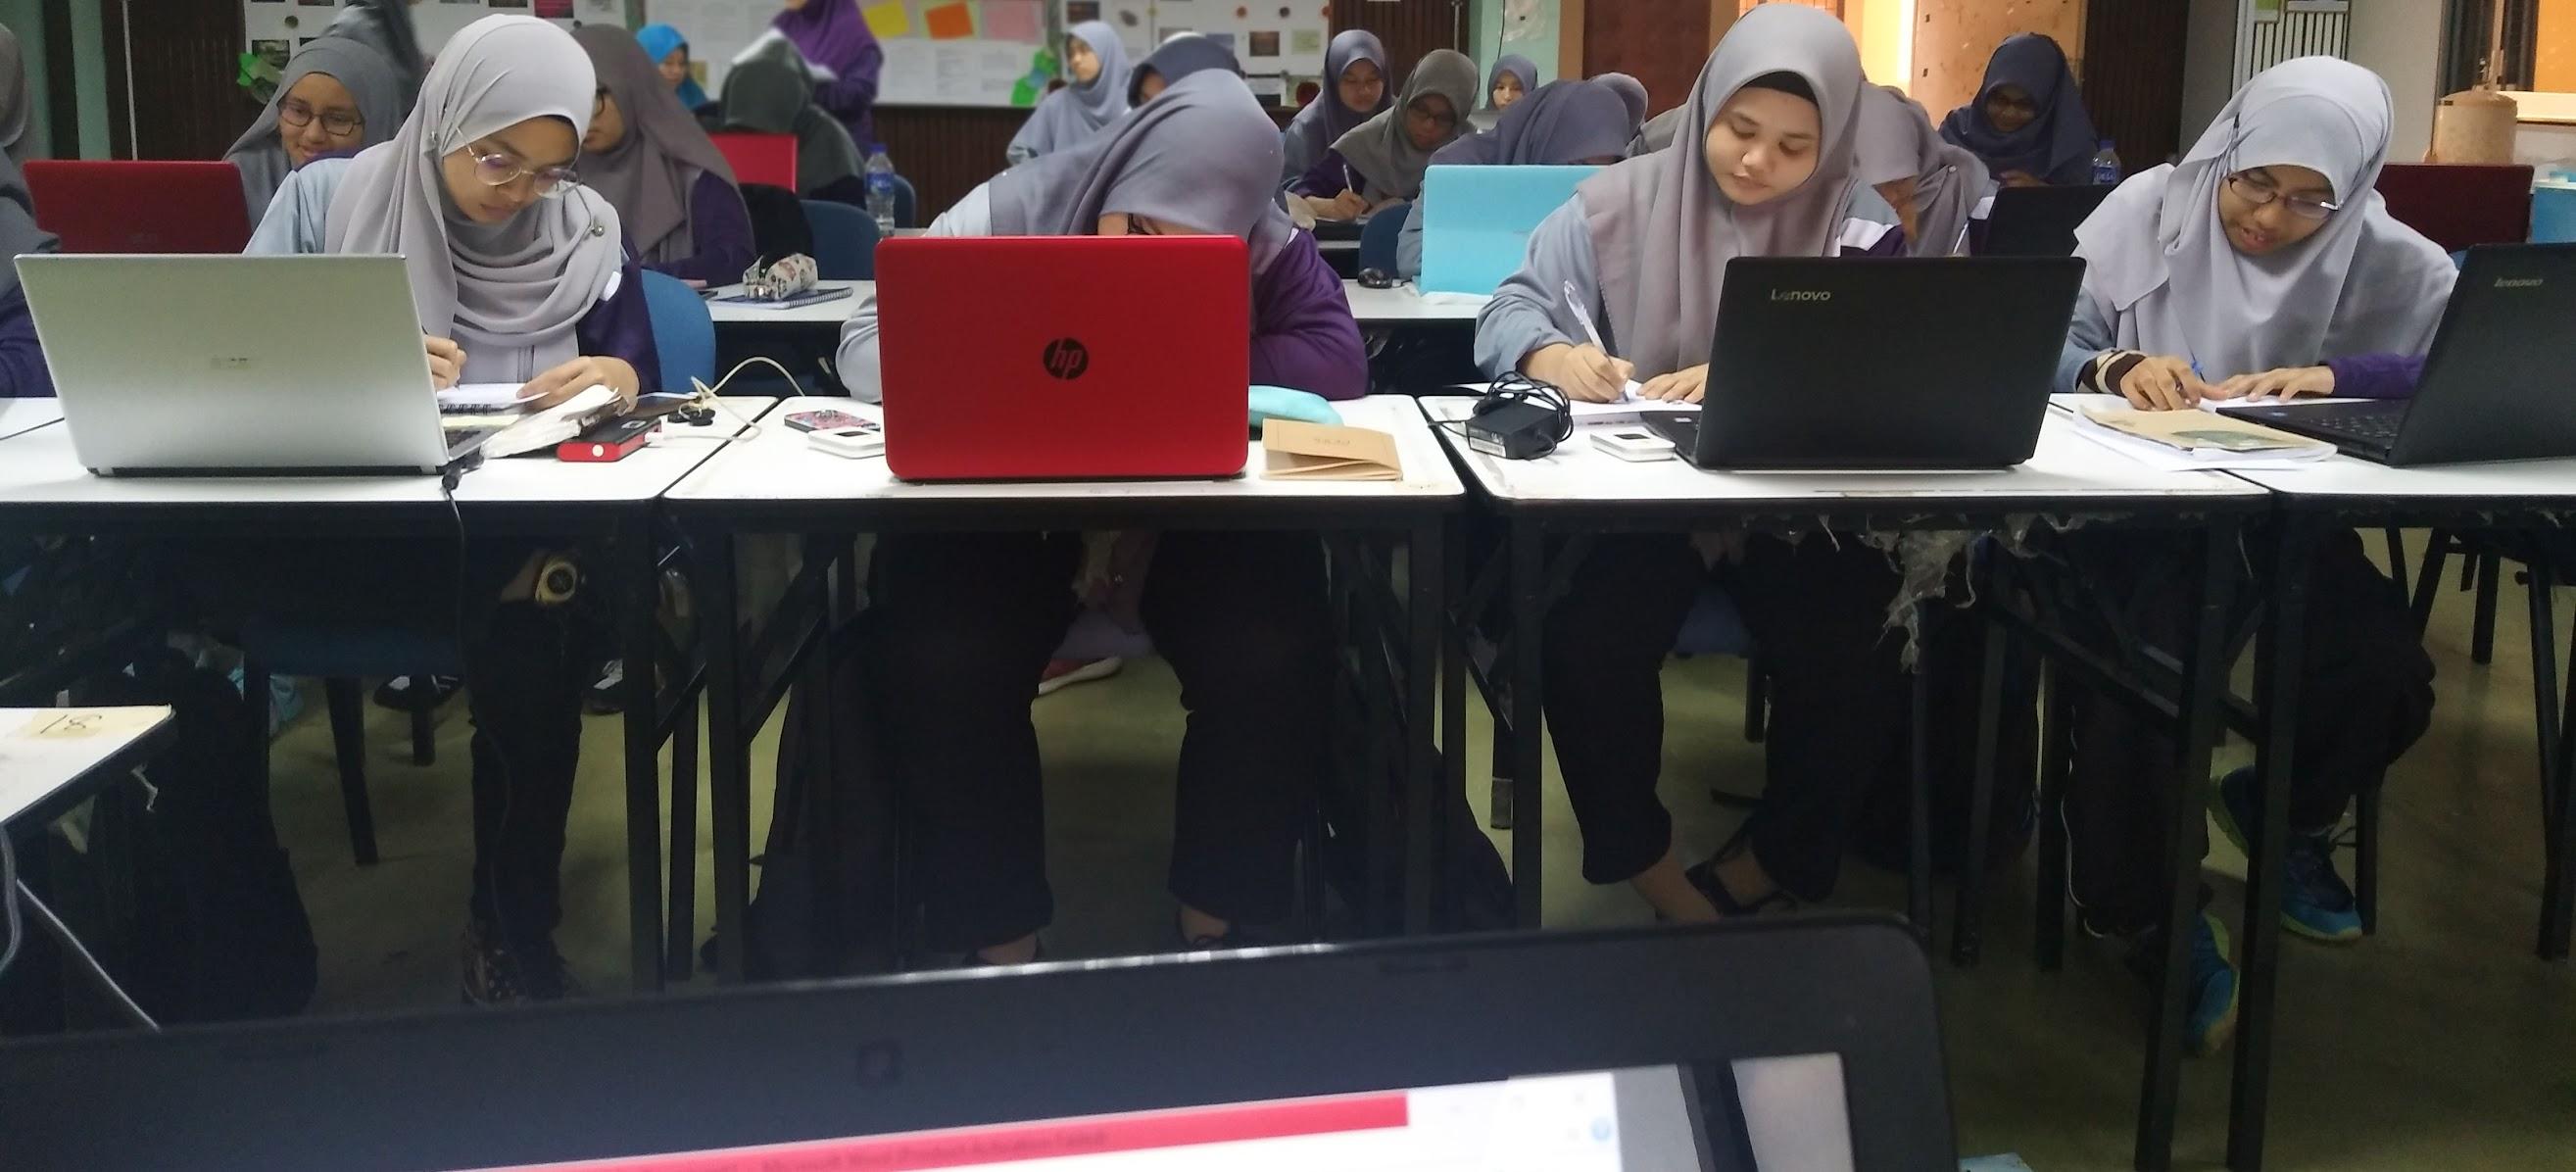 Bengkel Penulisan Akademik Di Durian Daun Melaka